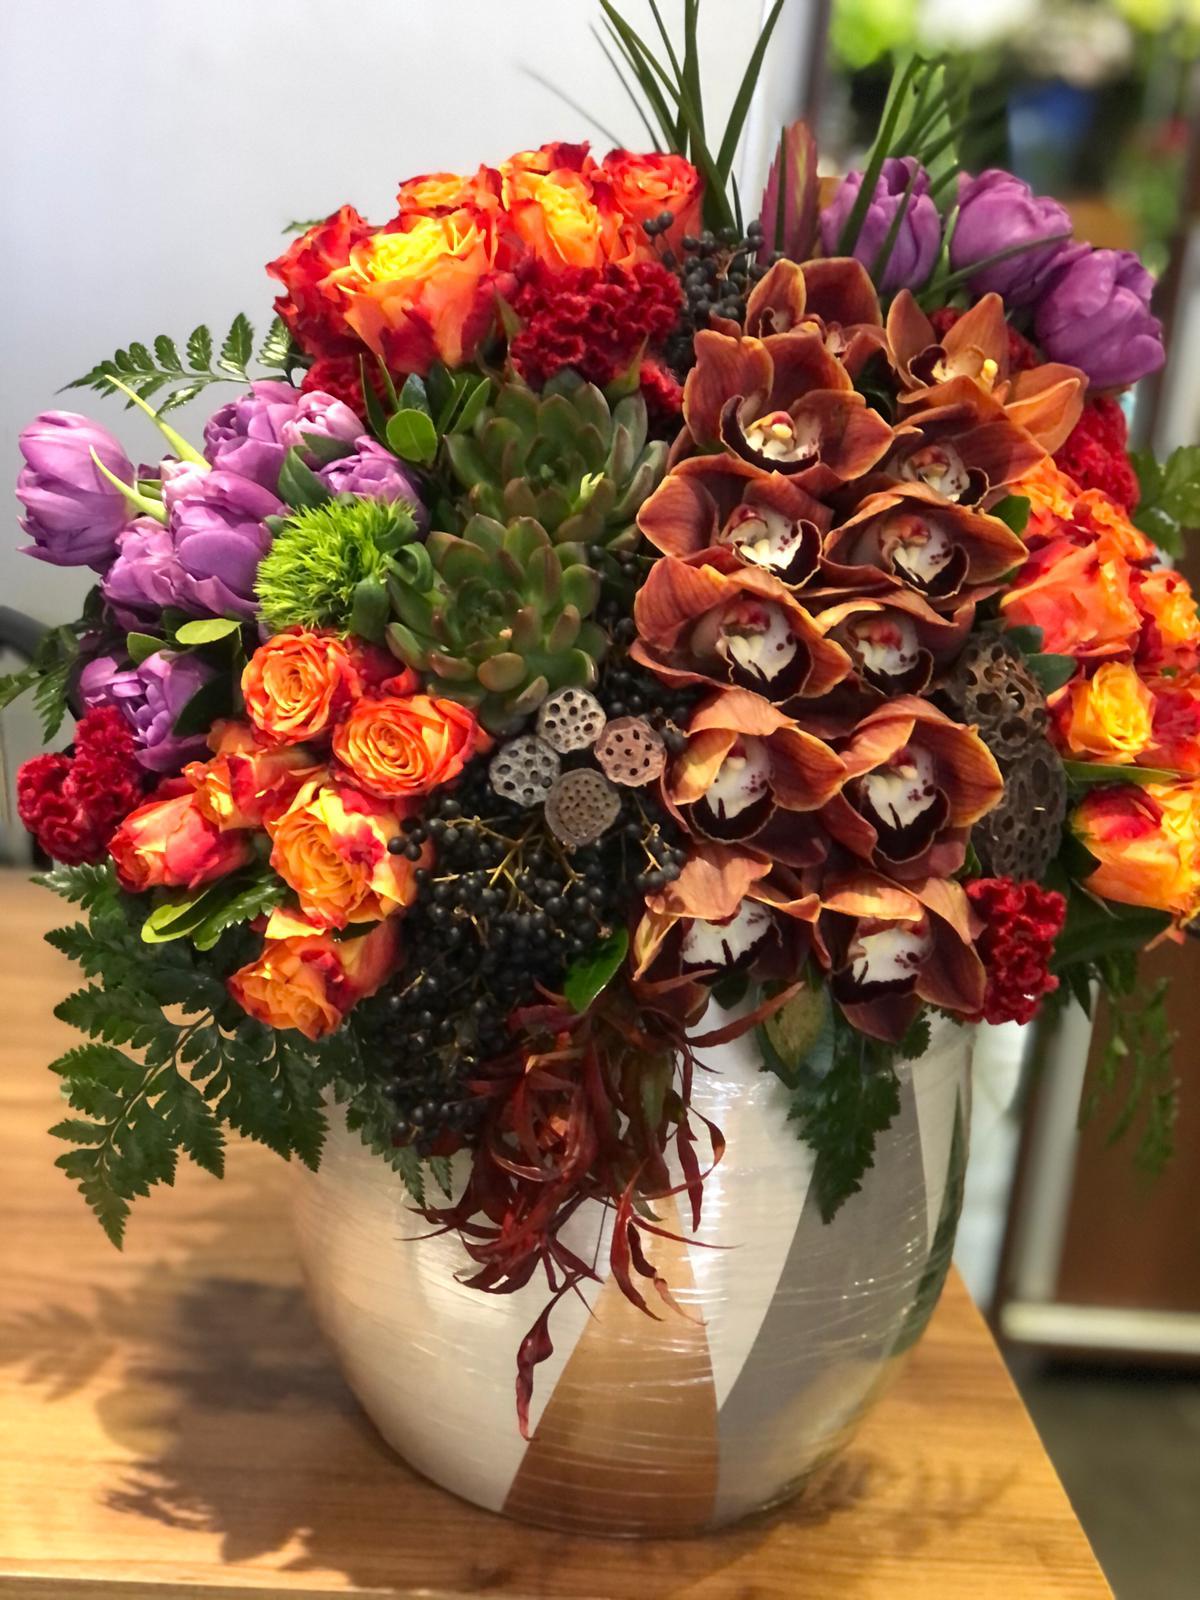 Turuncu Orkide Gül